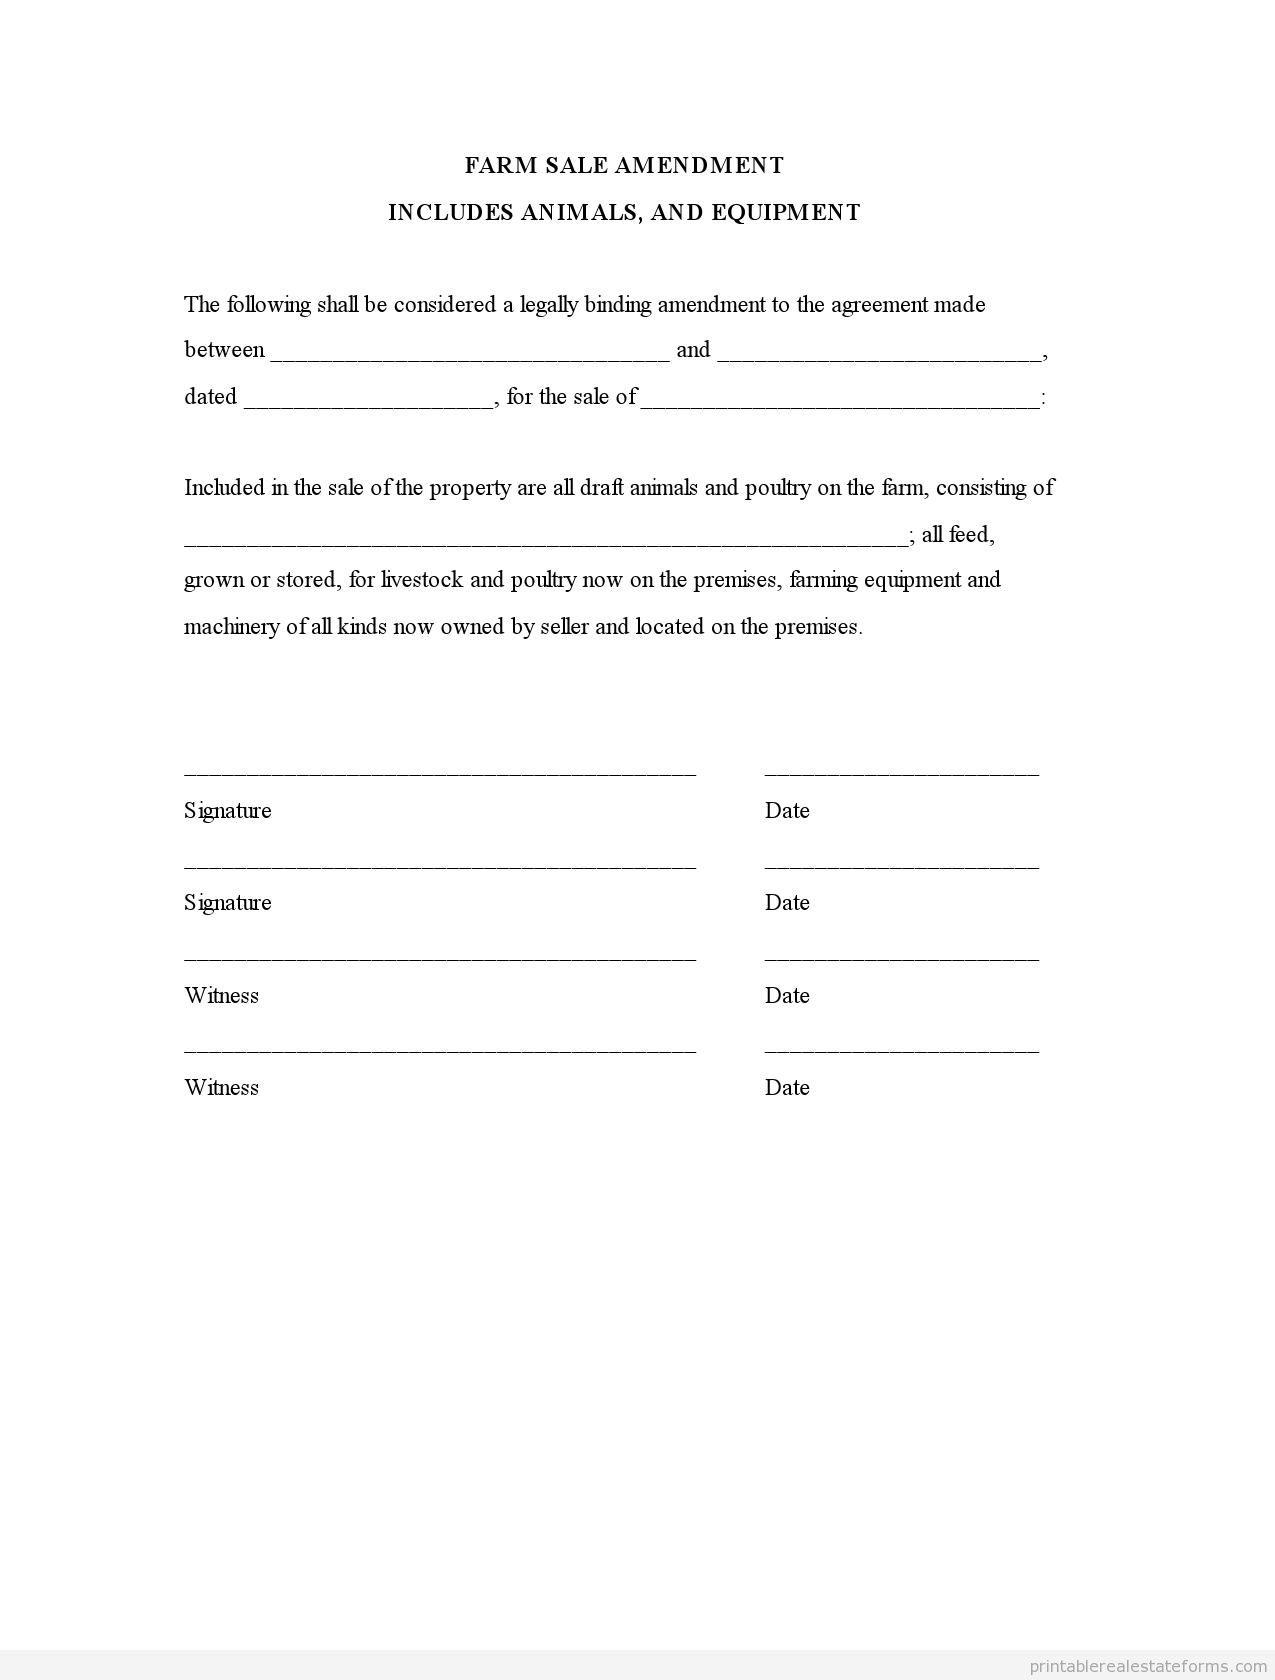 farm sale amendment includes animals equipment pdf. Black Bedroom Furniture Sets. Home Design Ideas